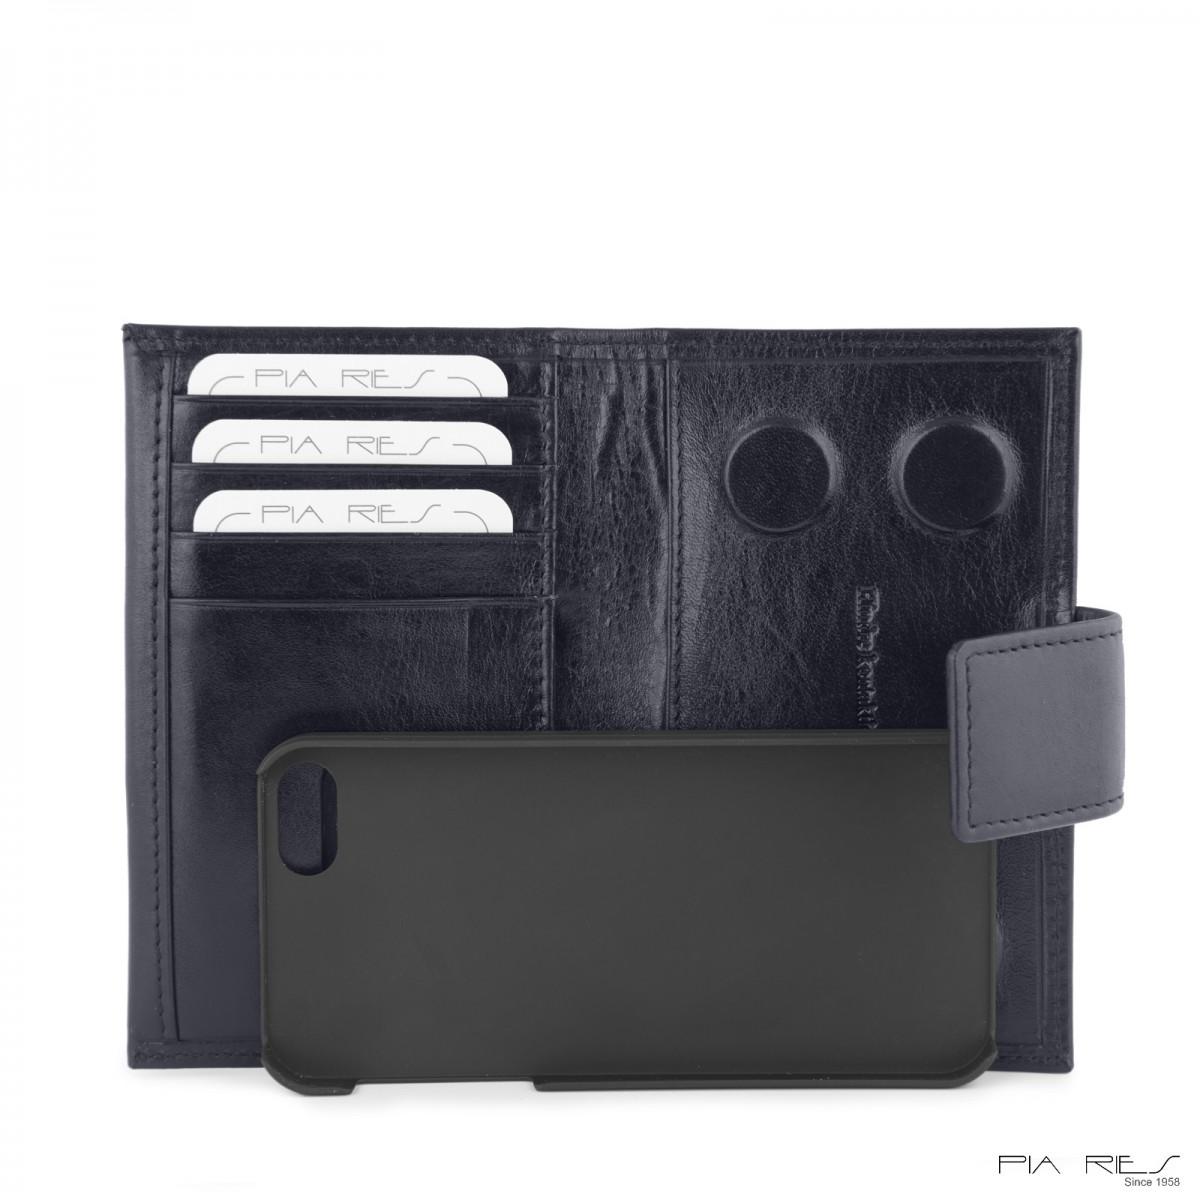 I-phone 5 lædercover-Mørkeblå-34